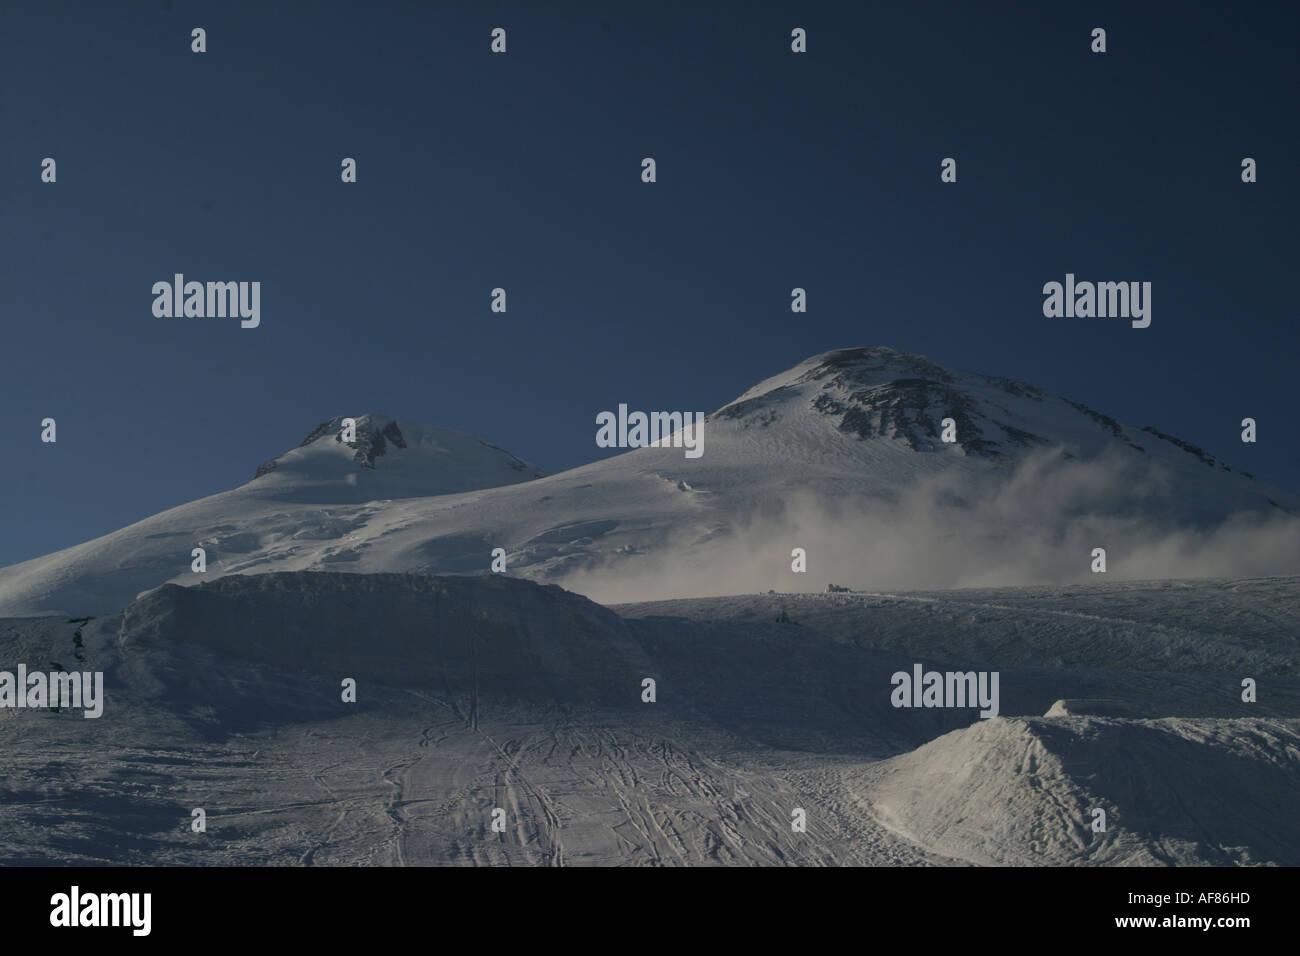 Mountains landscape 25 - Evening Elbrus in pure blue sky and snowboard big-airs, Caucasus, Elbrus region, Kabardino-Balkari - Stock Image